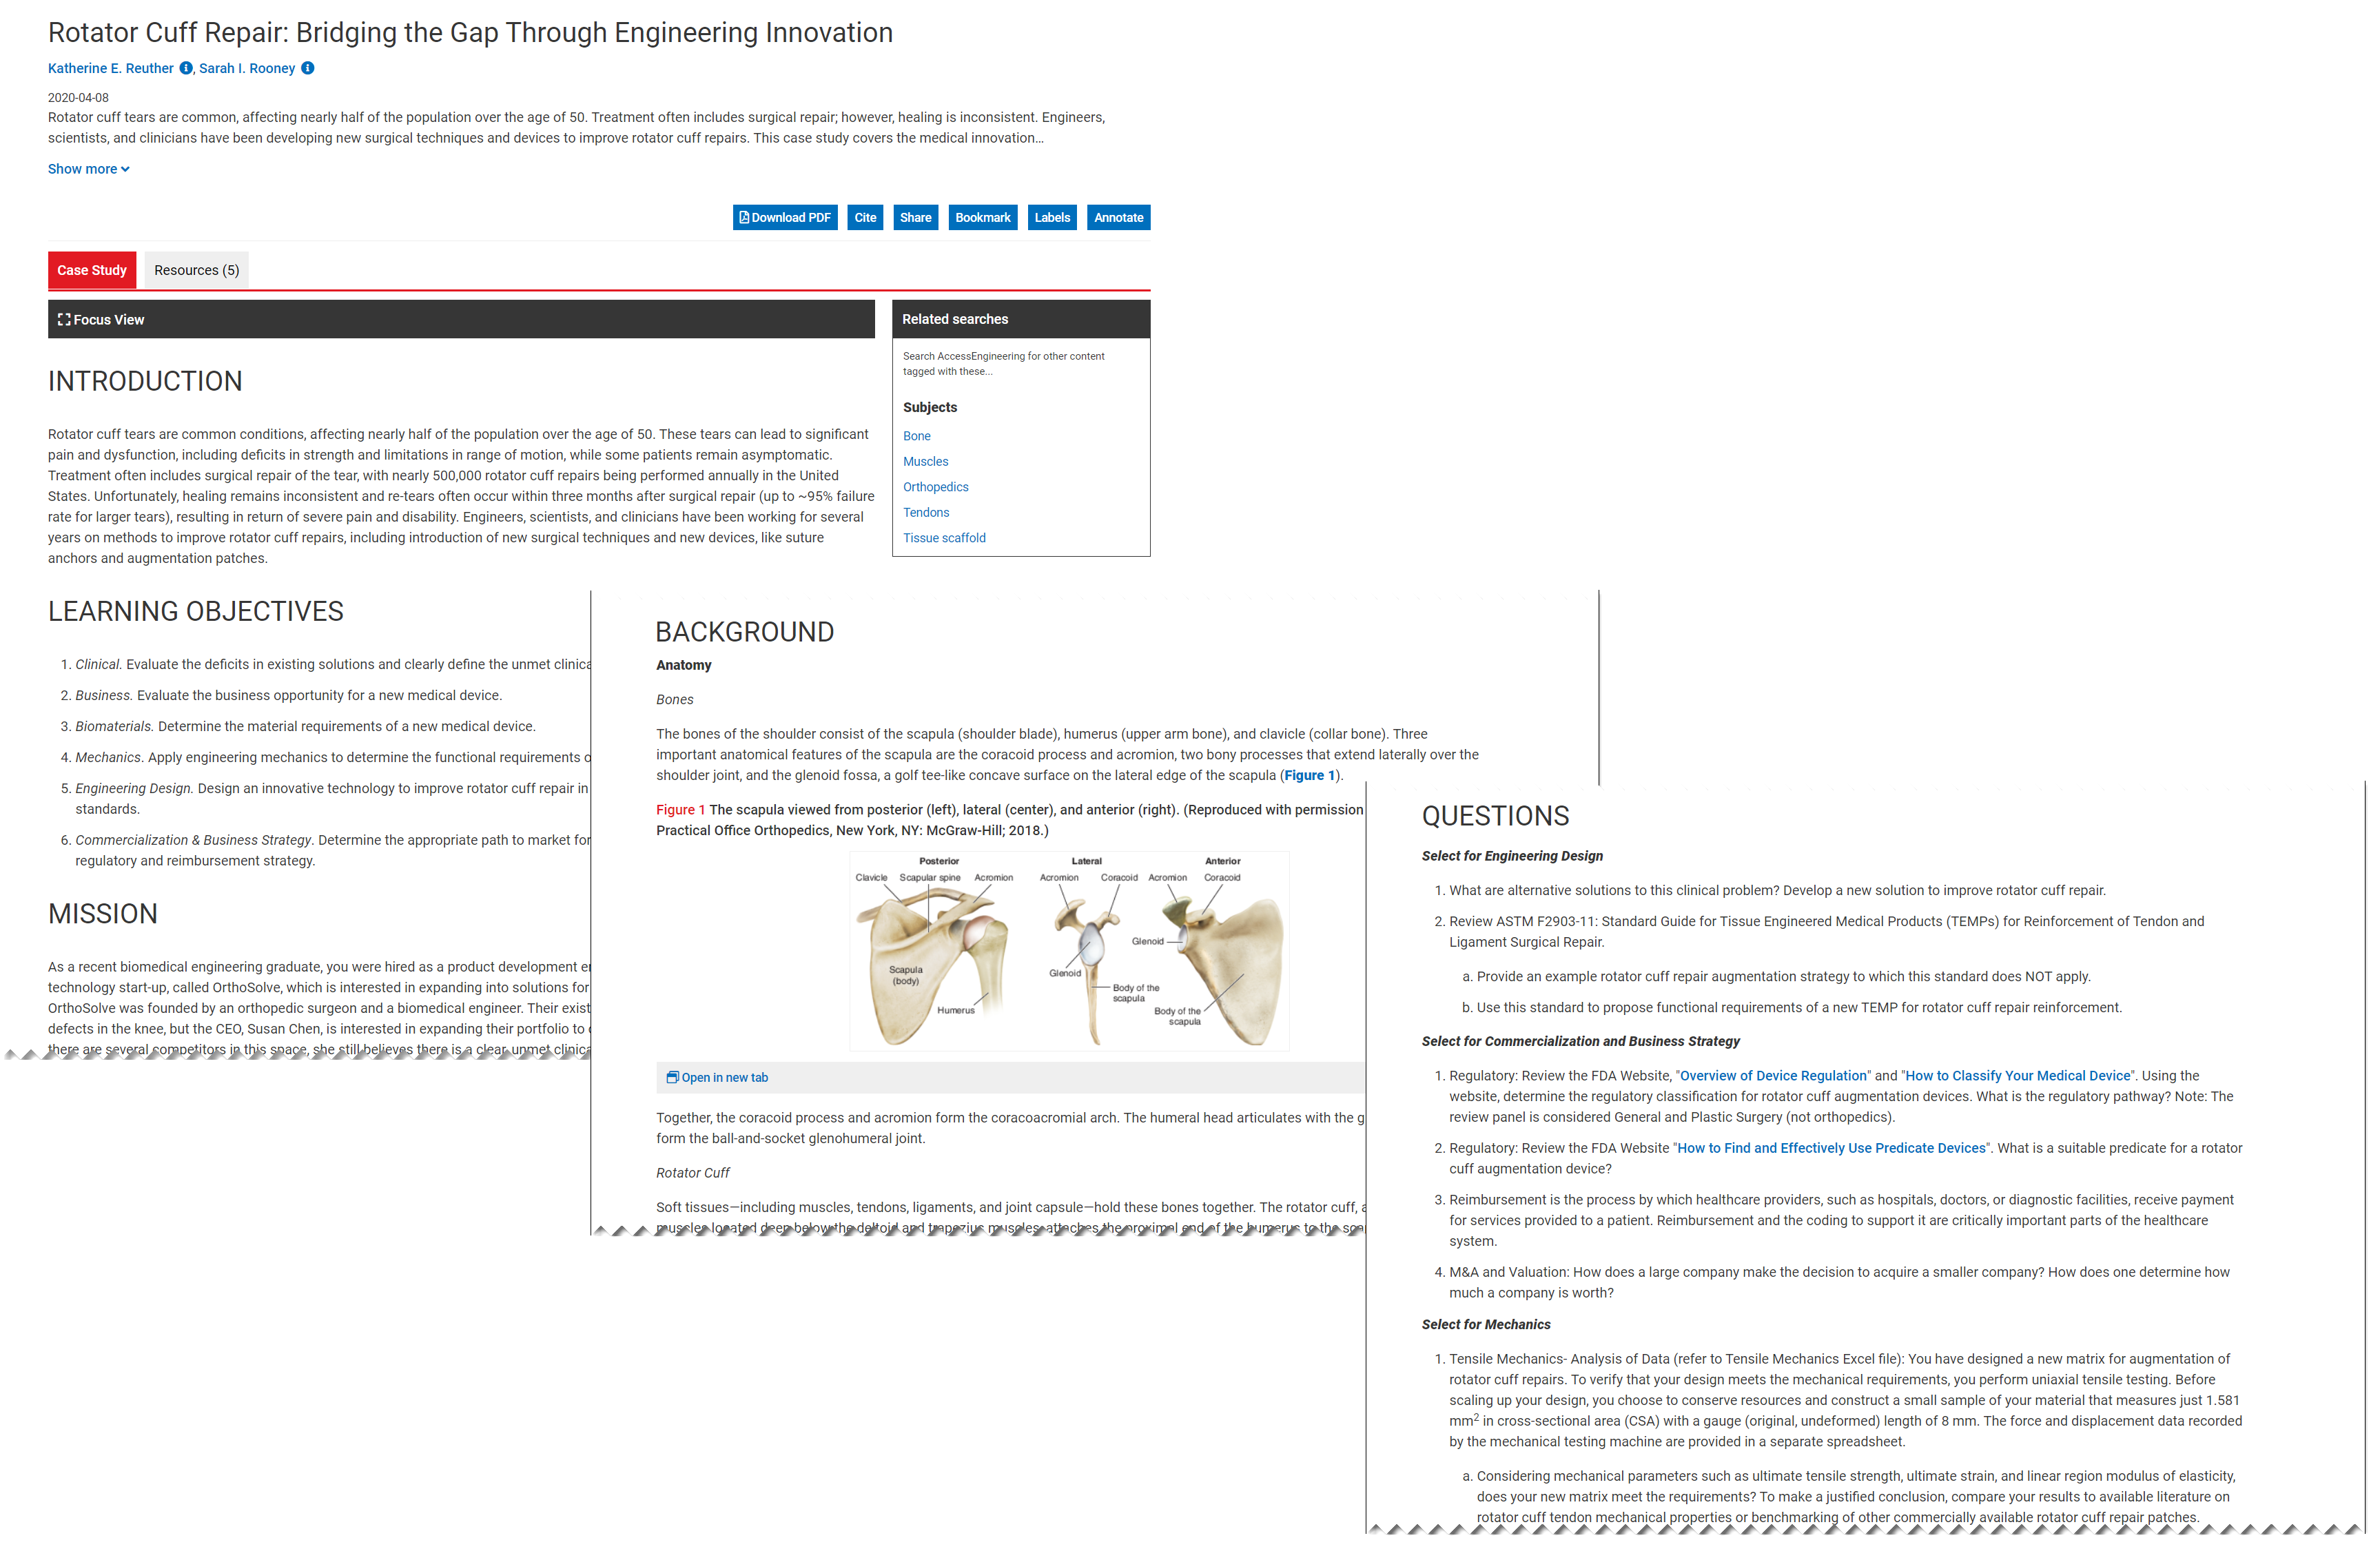 Image showing AccessEngineering case study layout